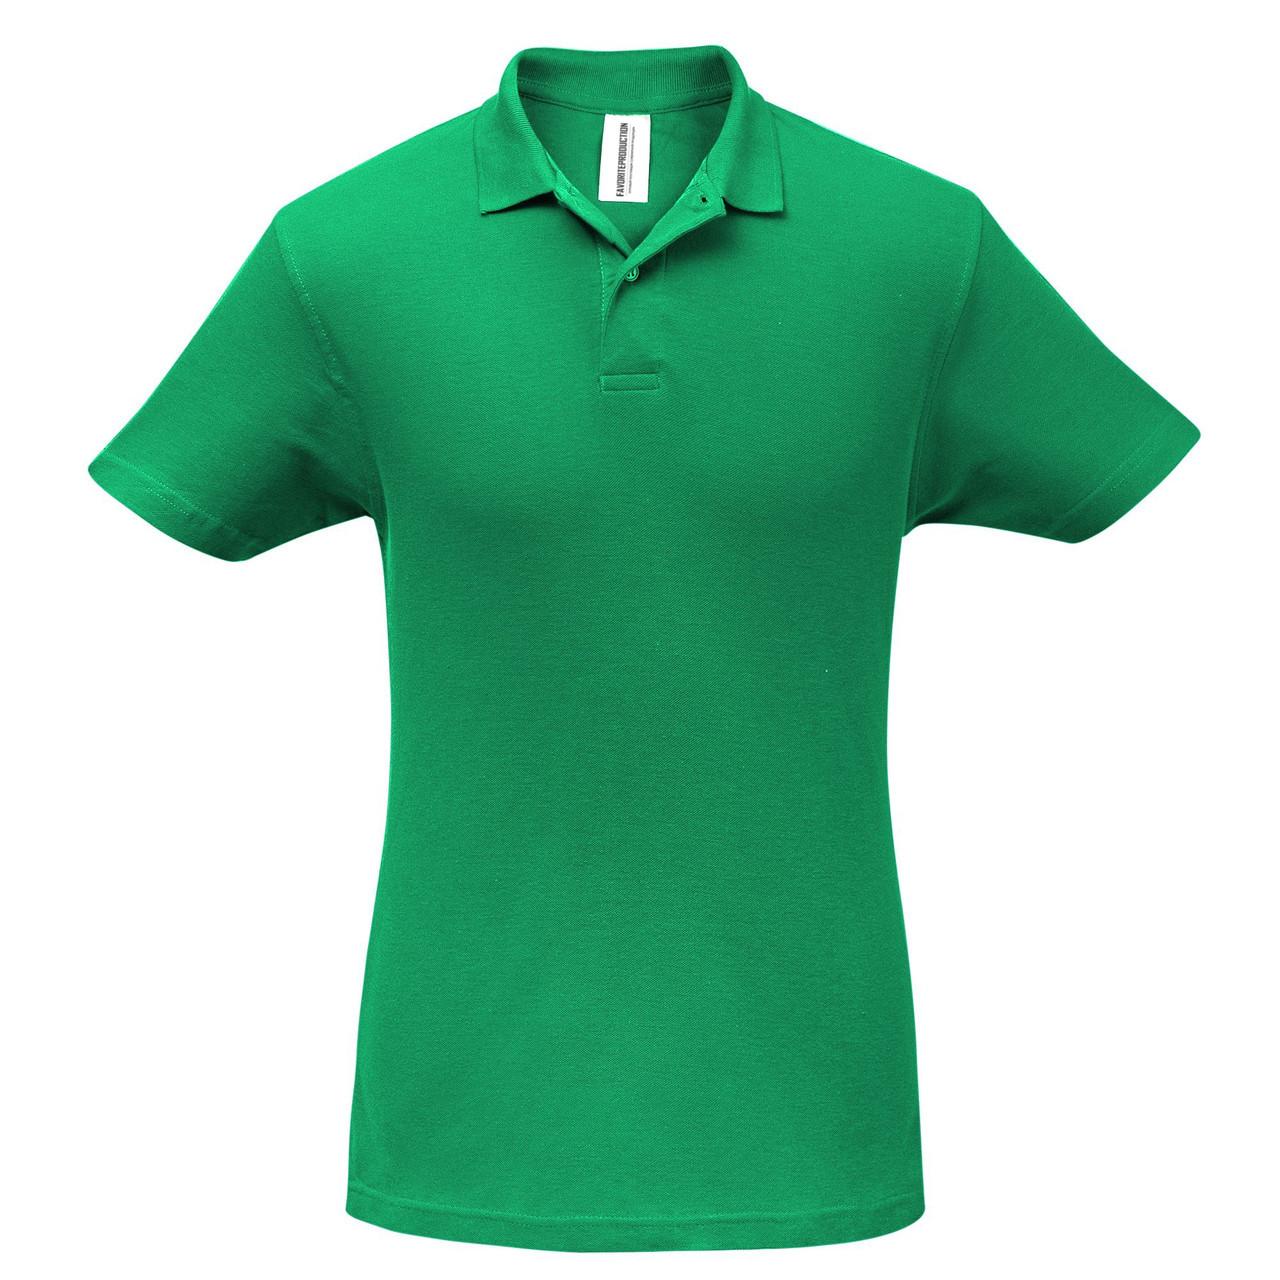 Футболка Поло Зеленая.200 гр.S